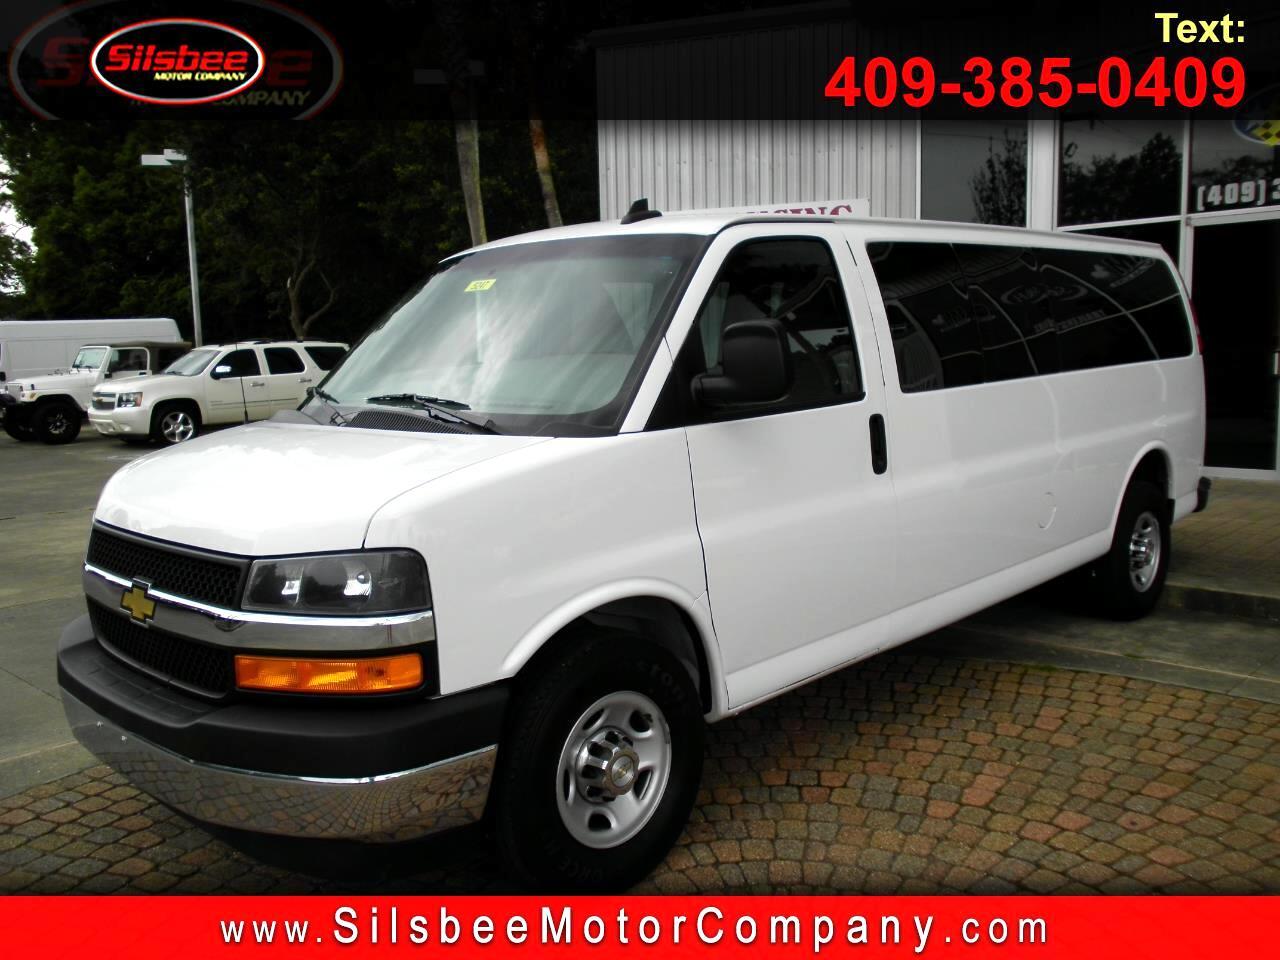 2018 Chevrolet Express Passenger RWD 3500 155